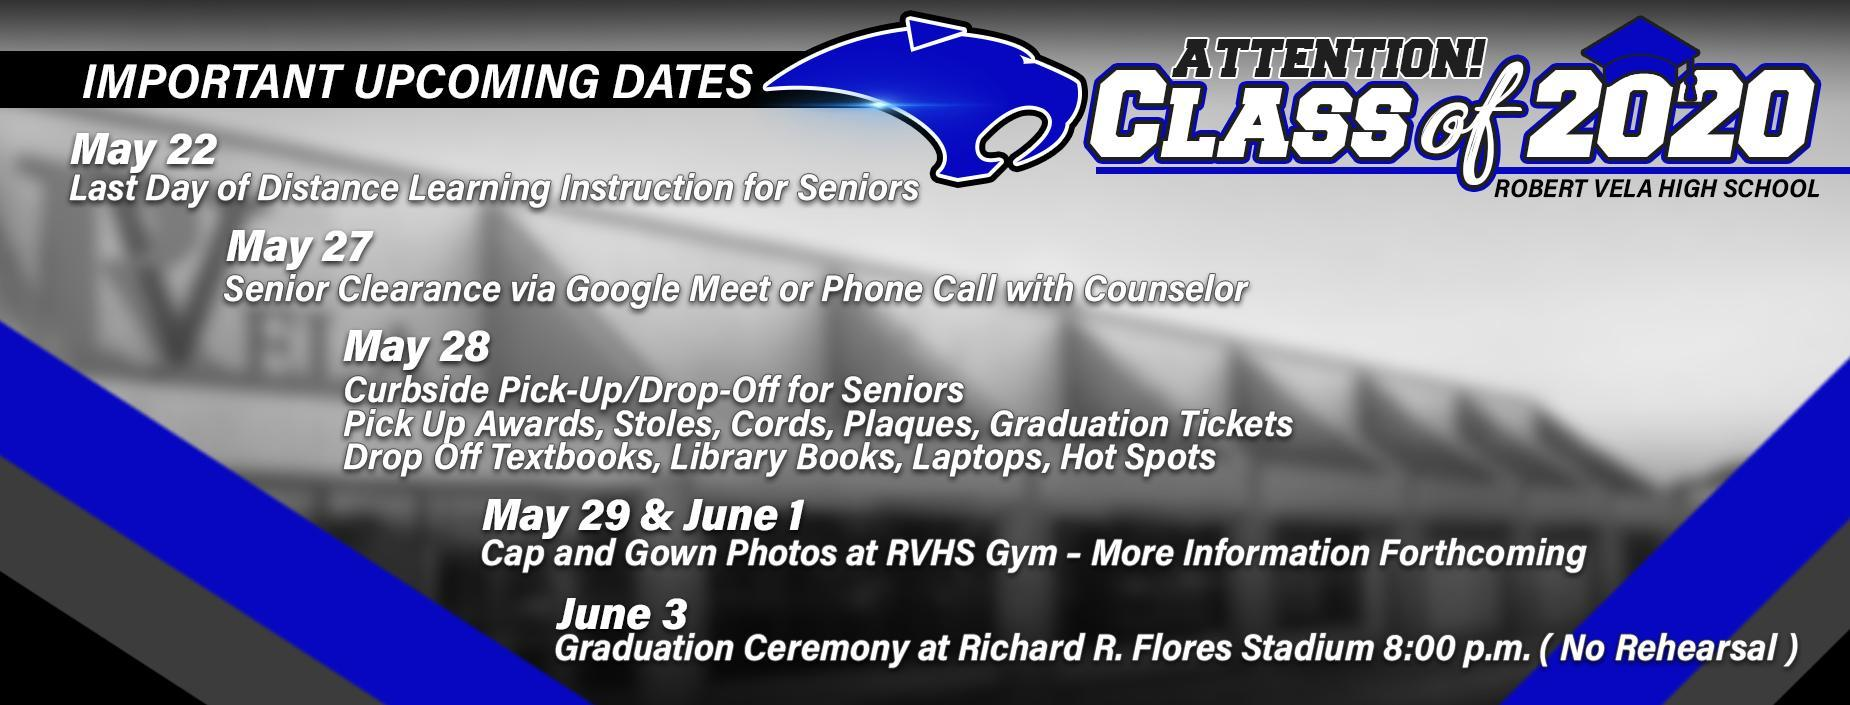 Important Upcoming Dates Class of 2020 Robert Vela High School